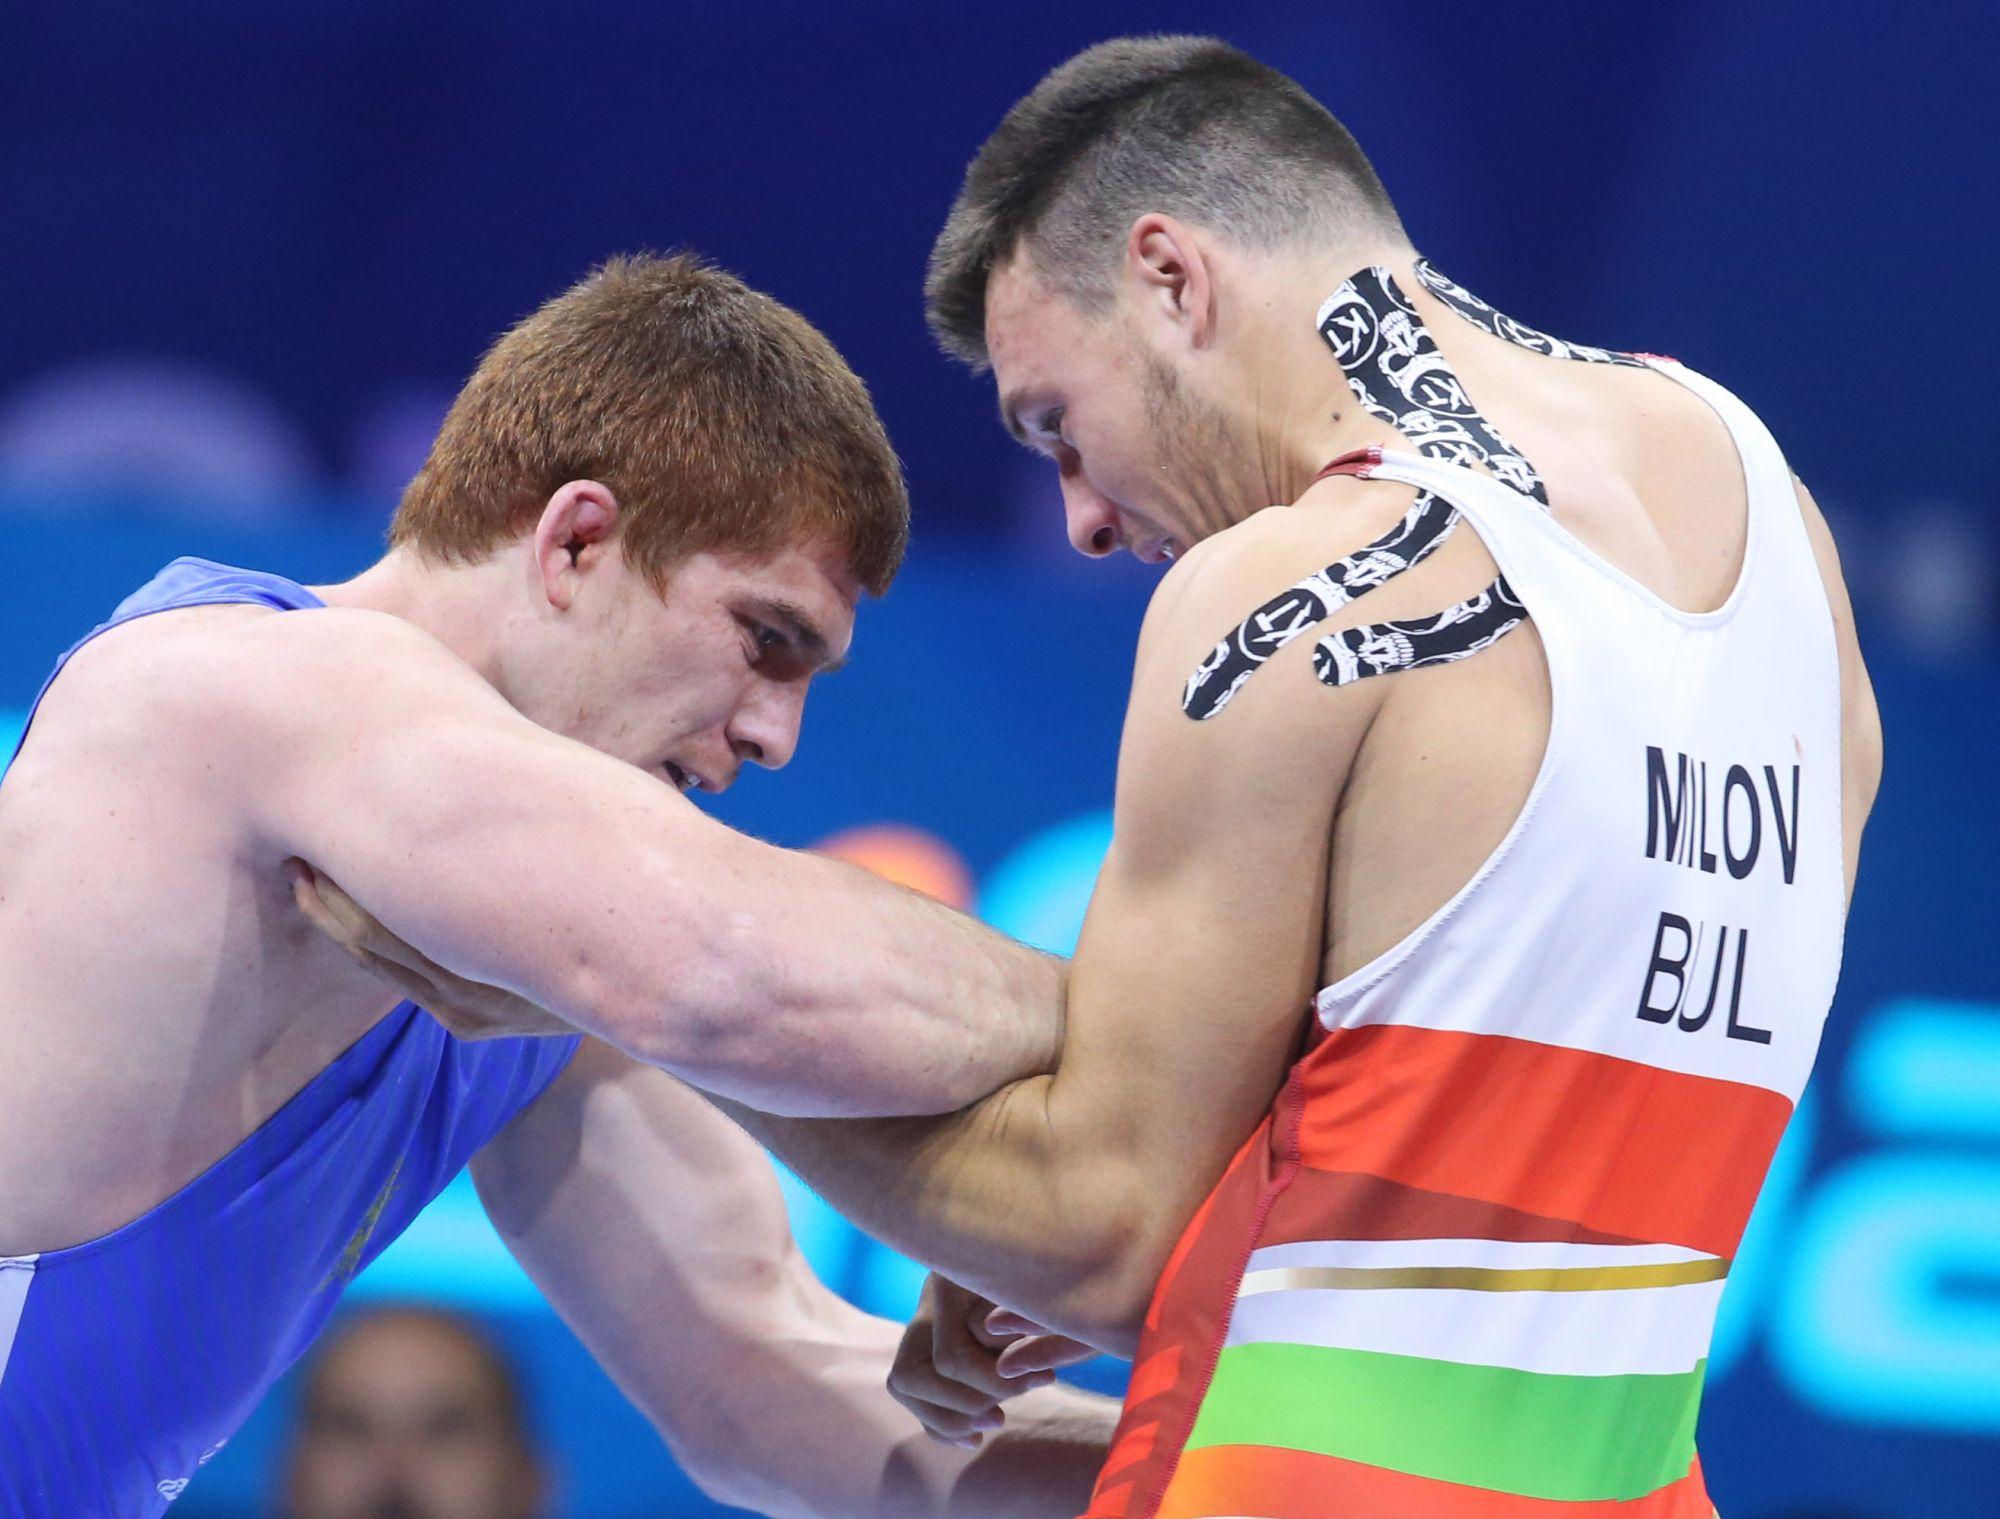 Милов от Будапеща: Ще тренирам още по-упорито!